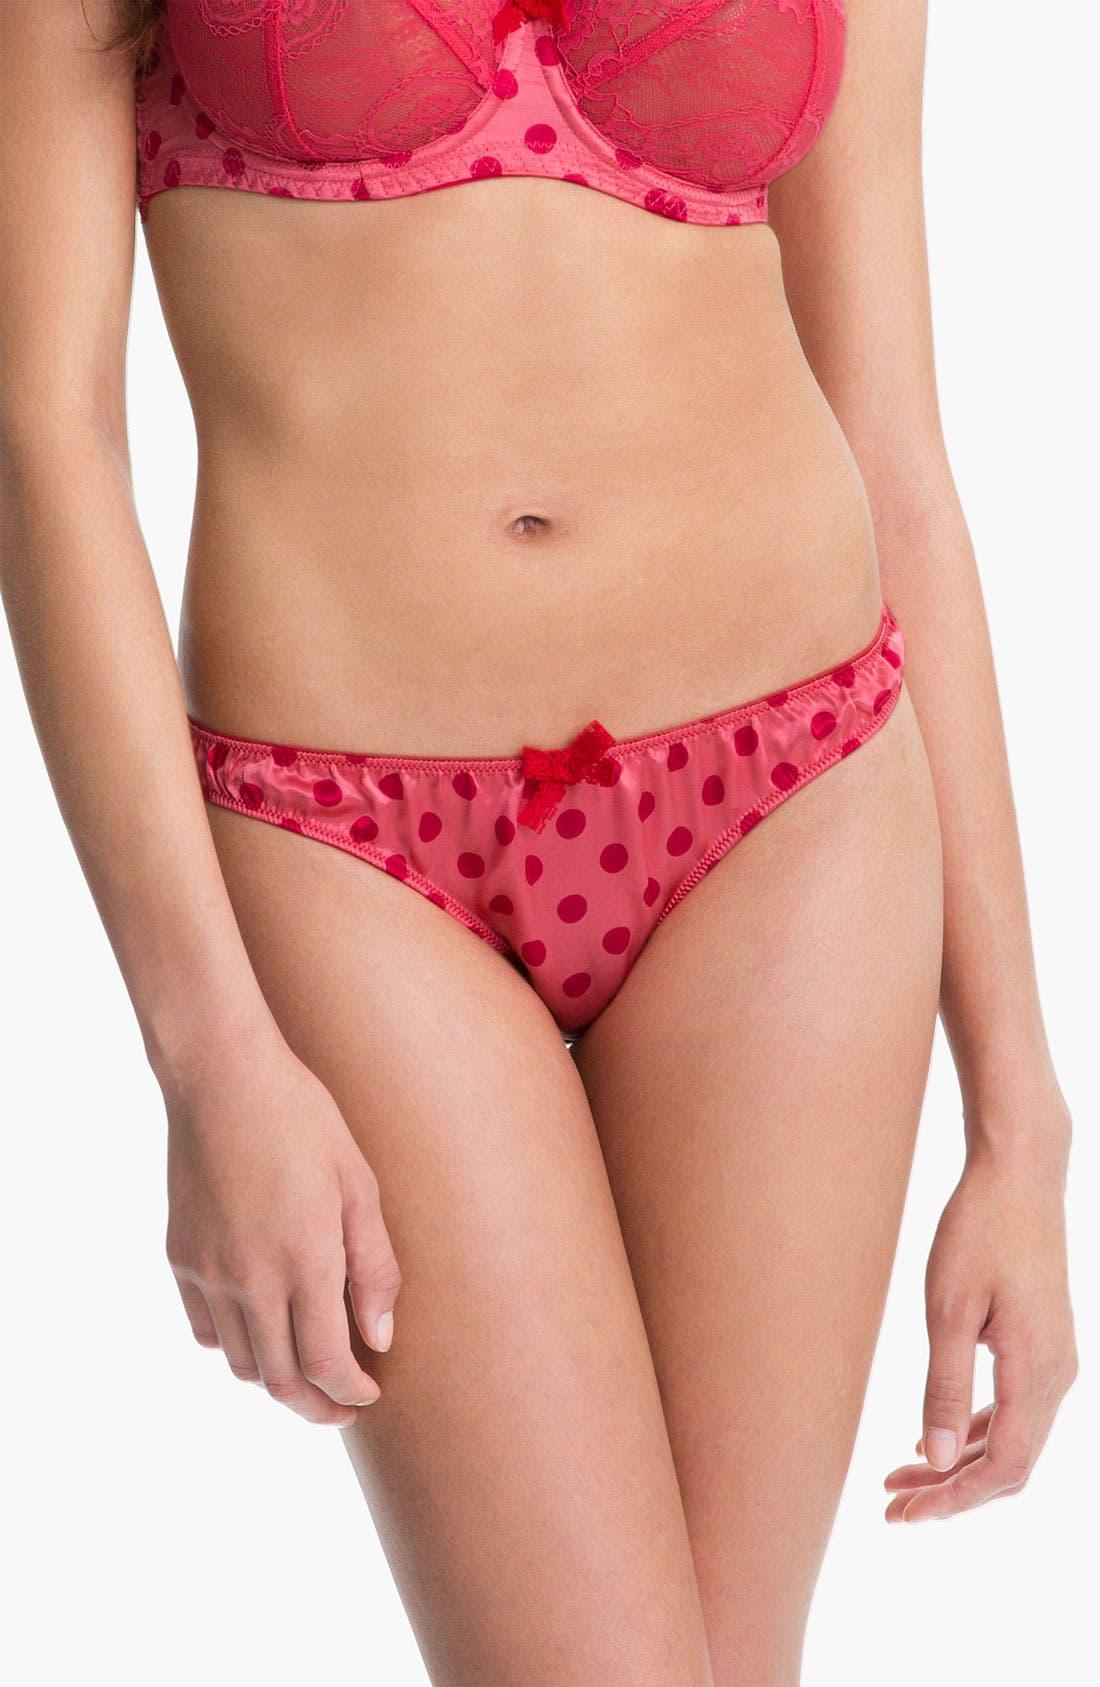 Alternate Image 1 Selected - Mimi Holliday 'Confetti Bomb' Classic Bikini